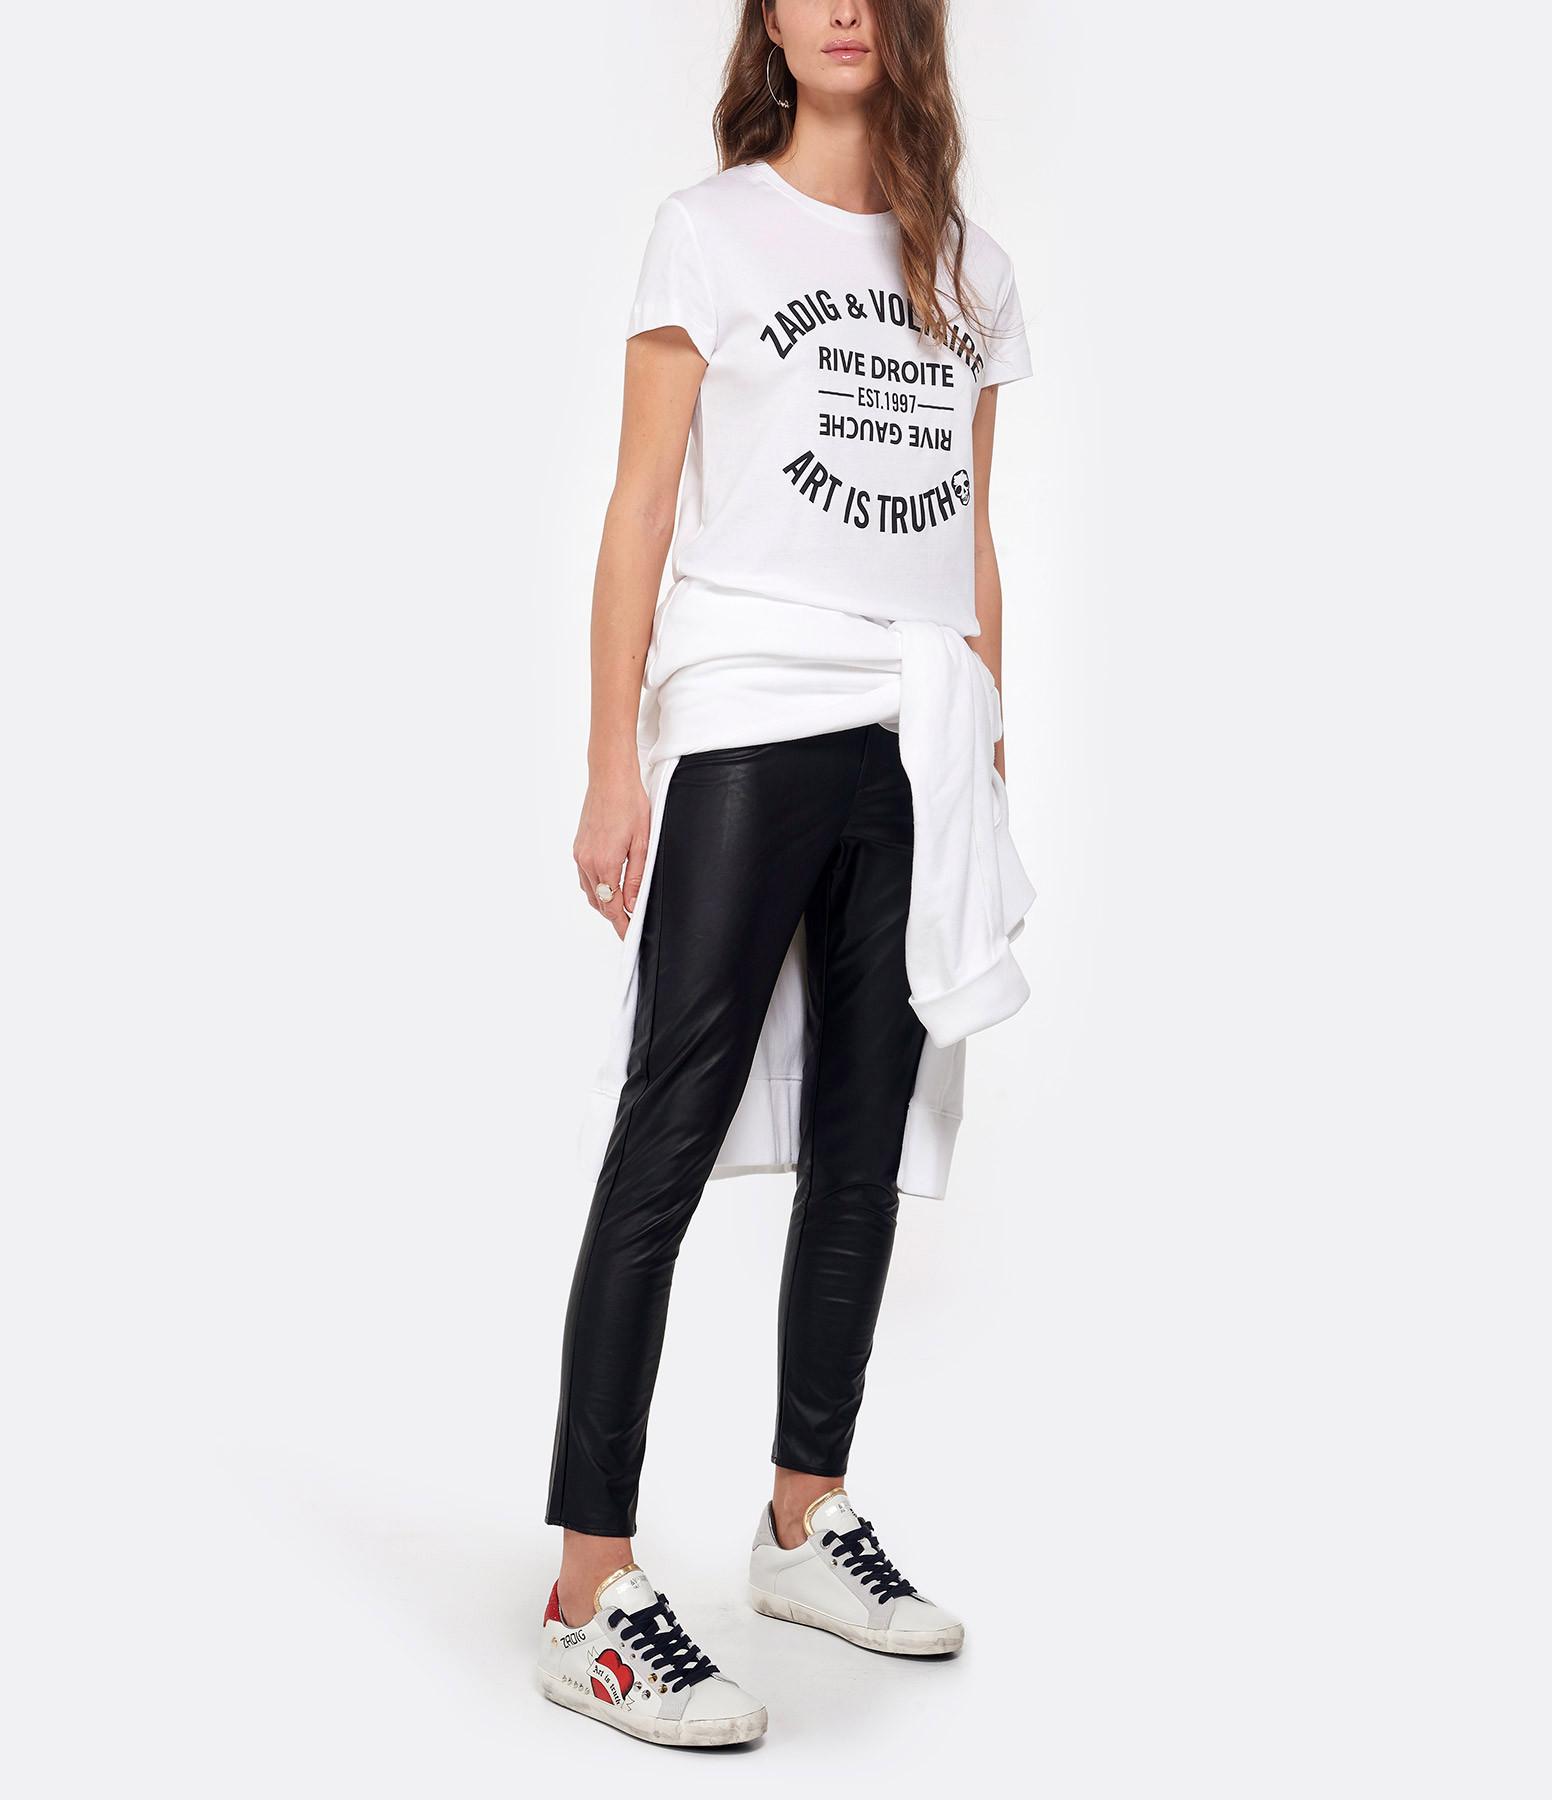 ZADIG & VOLTAIRE - Tee-shirt Walk Blason Coton Blanc